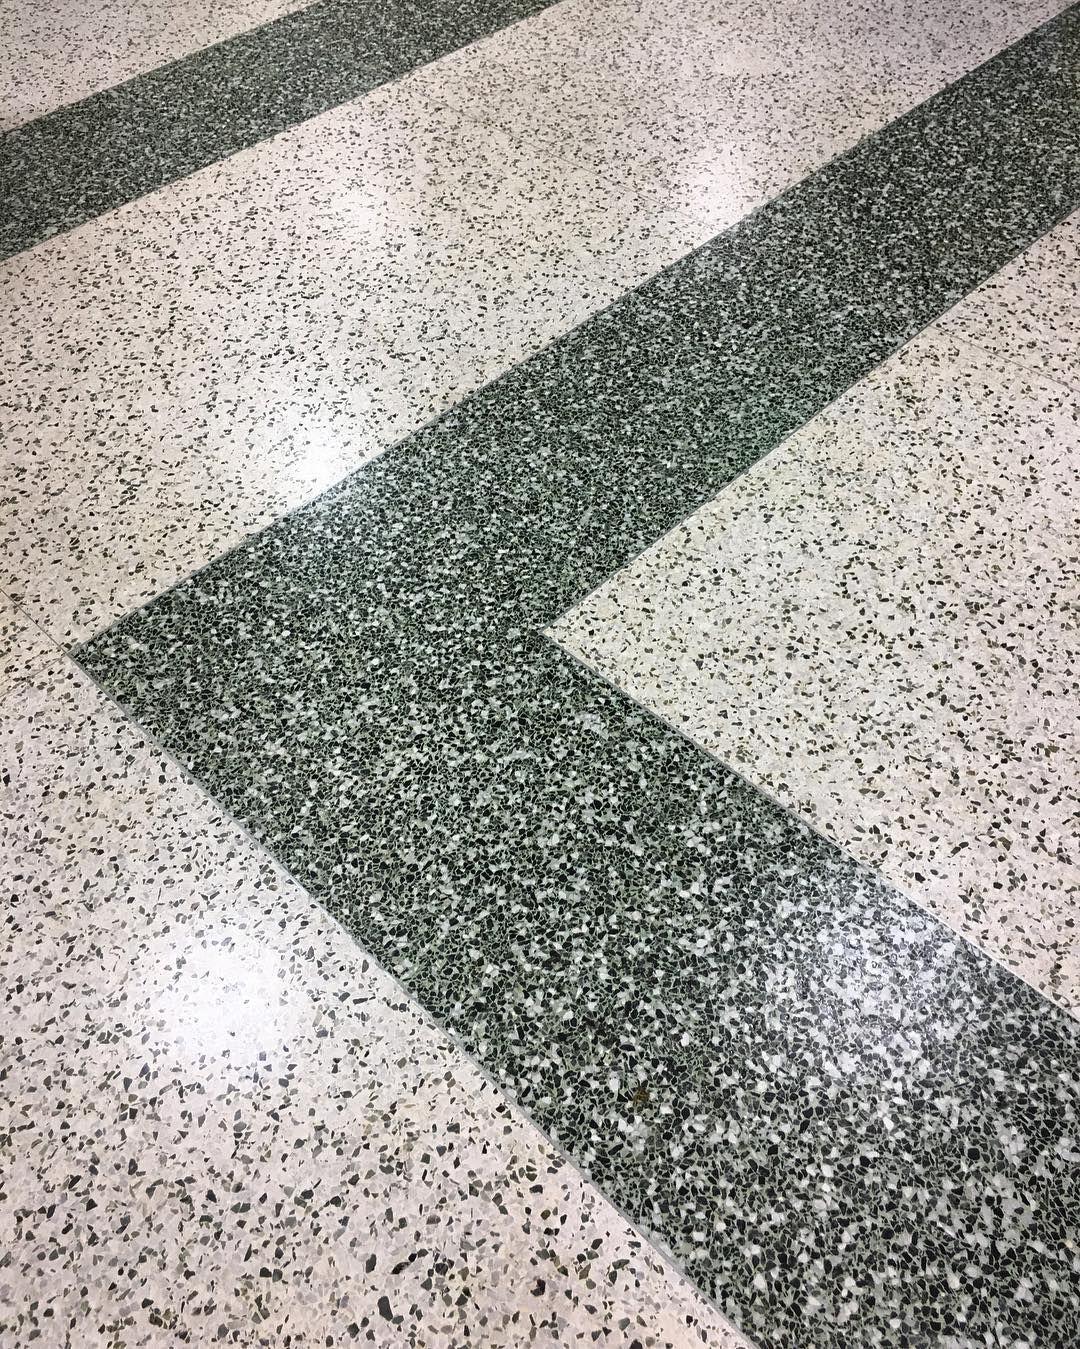 Green And White Terrazzo Stripes Publix Flooring